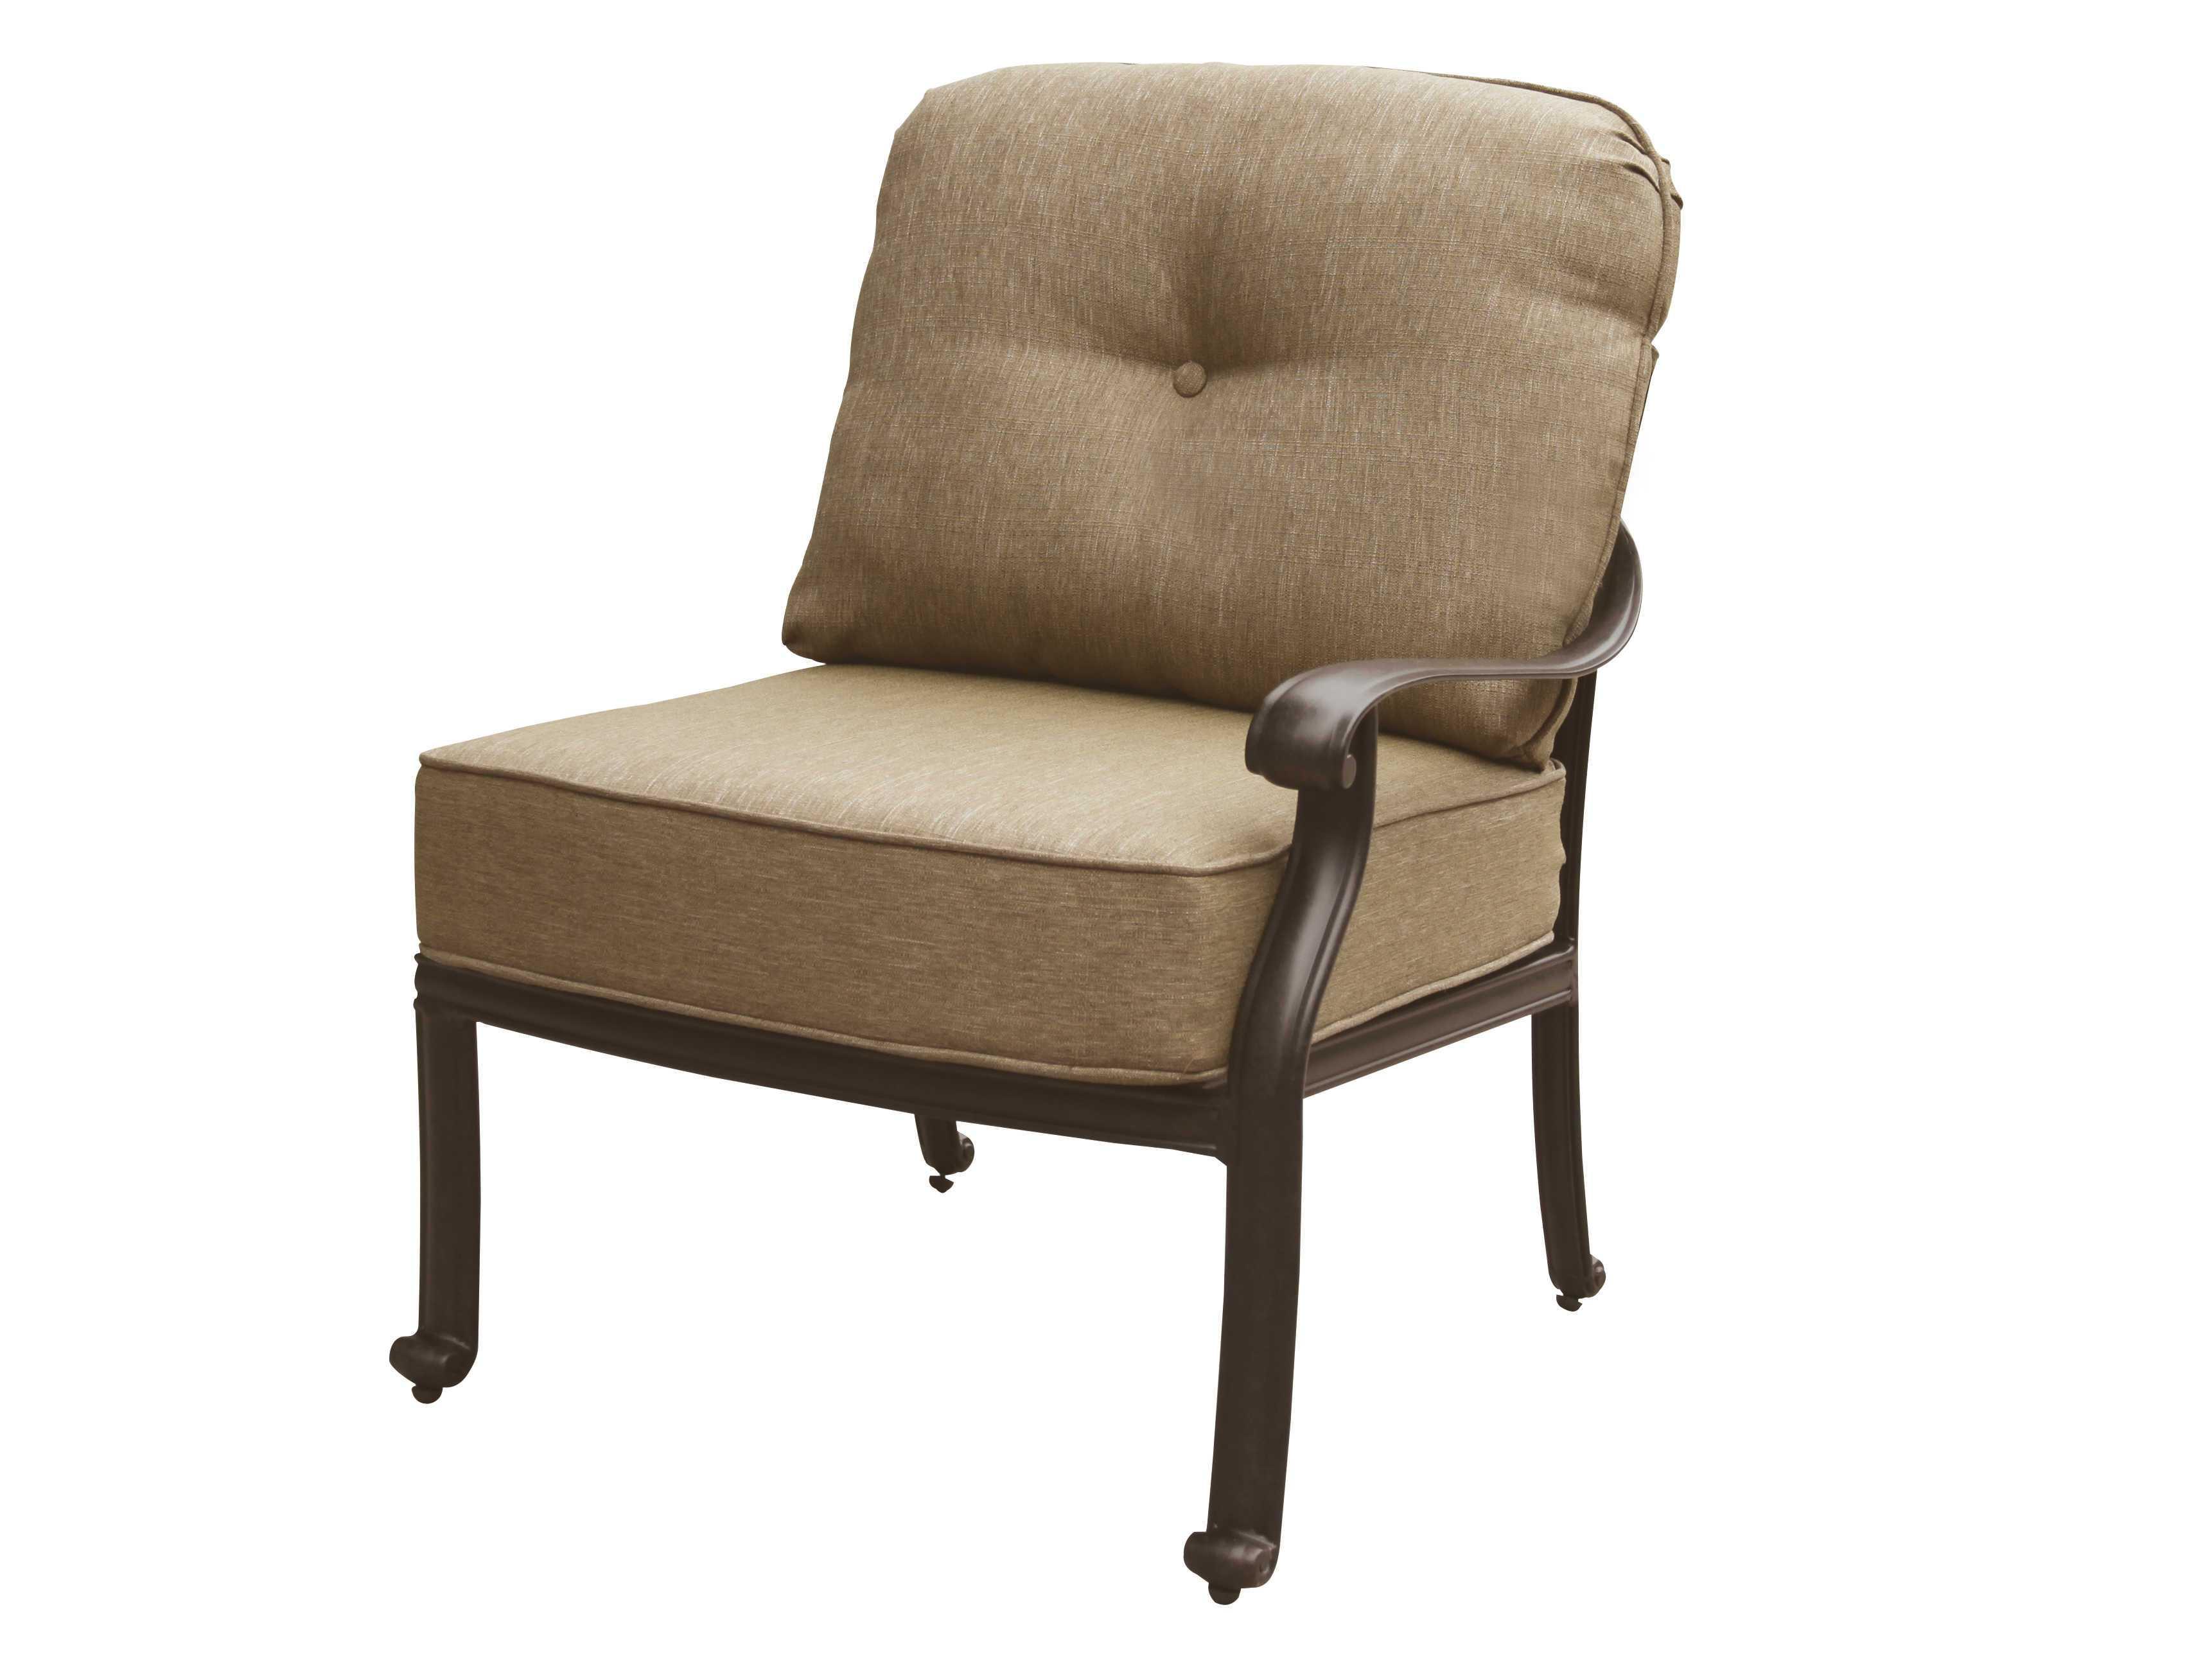 Wondrous Darlee Outdoor Living Standard Elisabeth Cast Aluminum Antique Bronze Sectional Right Facing Arm Chair Interior Design Ideas Clesiryabchikinfo